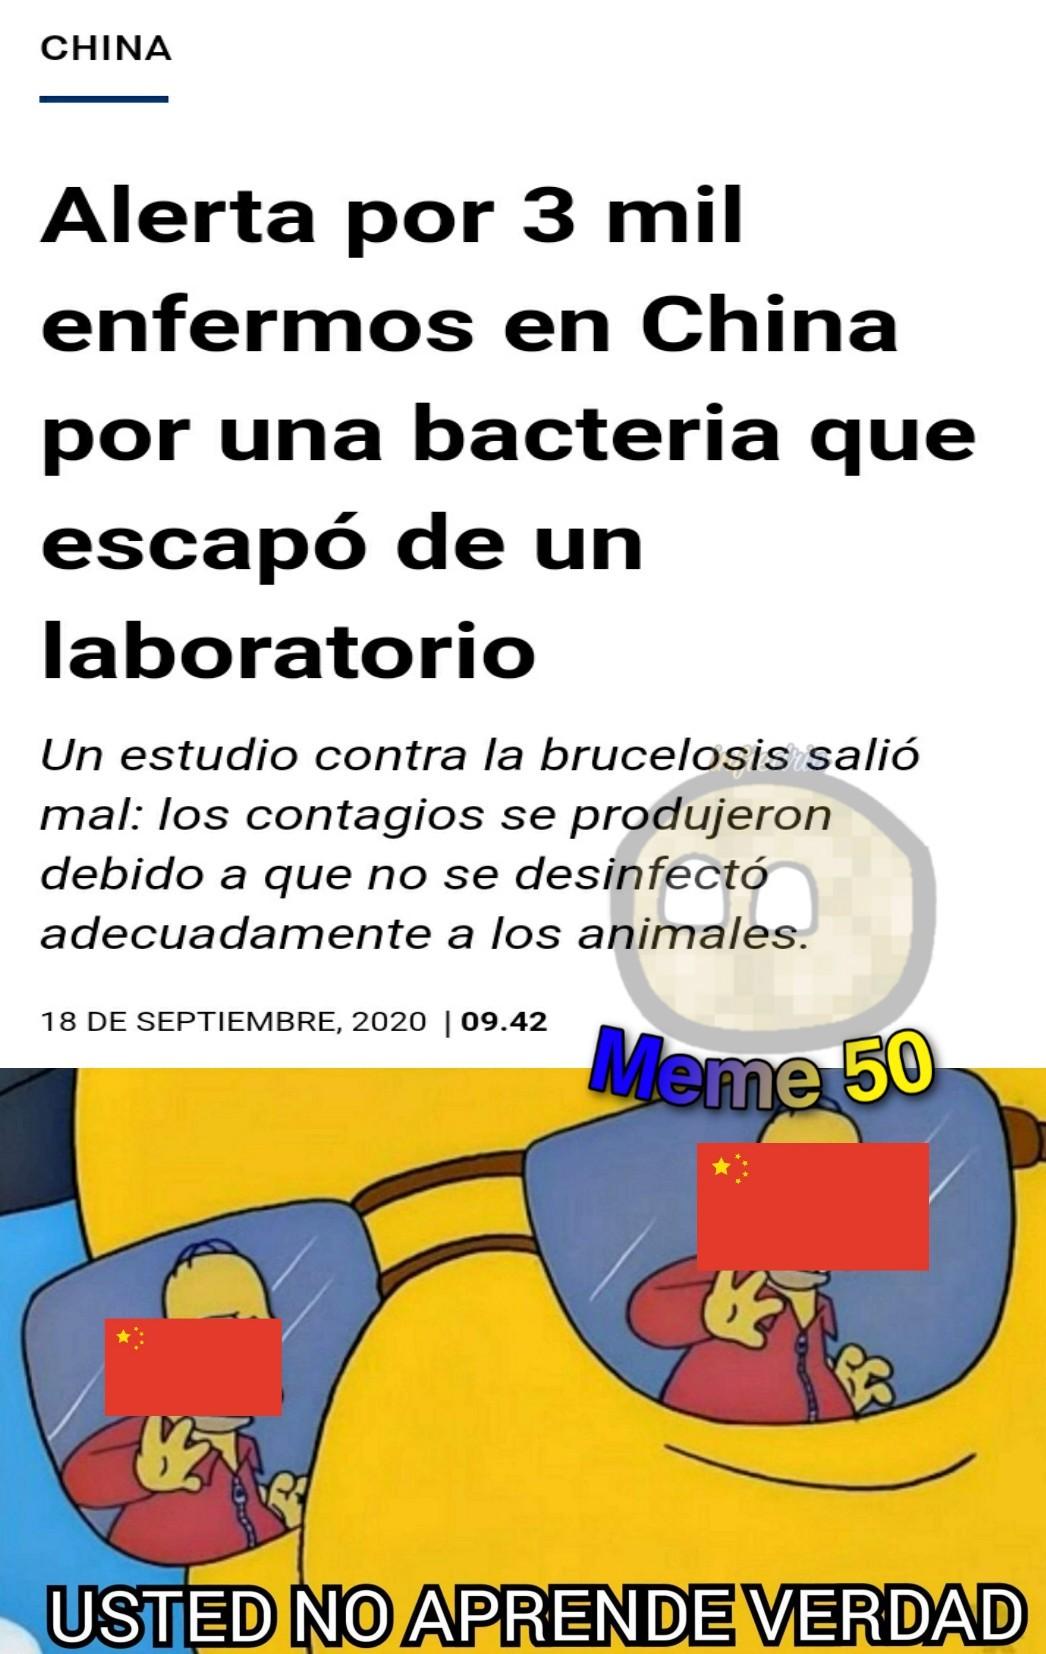 Meme n°50